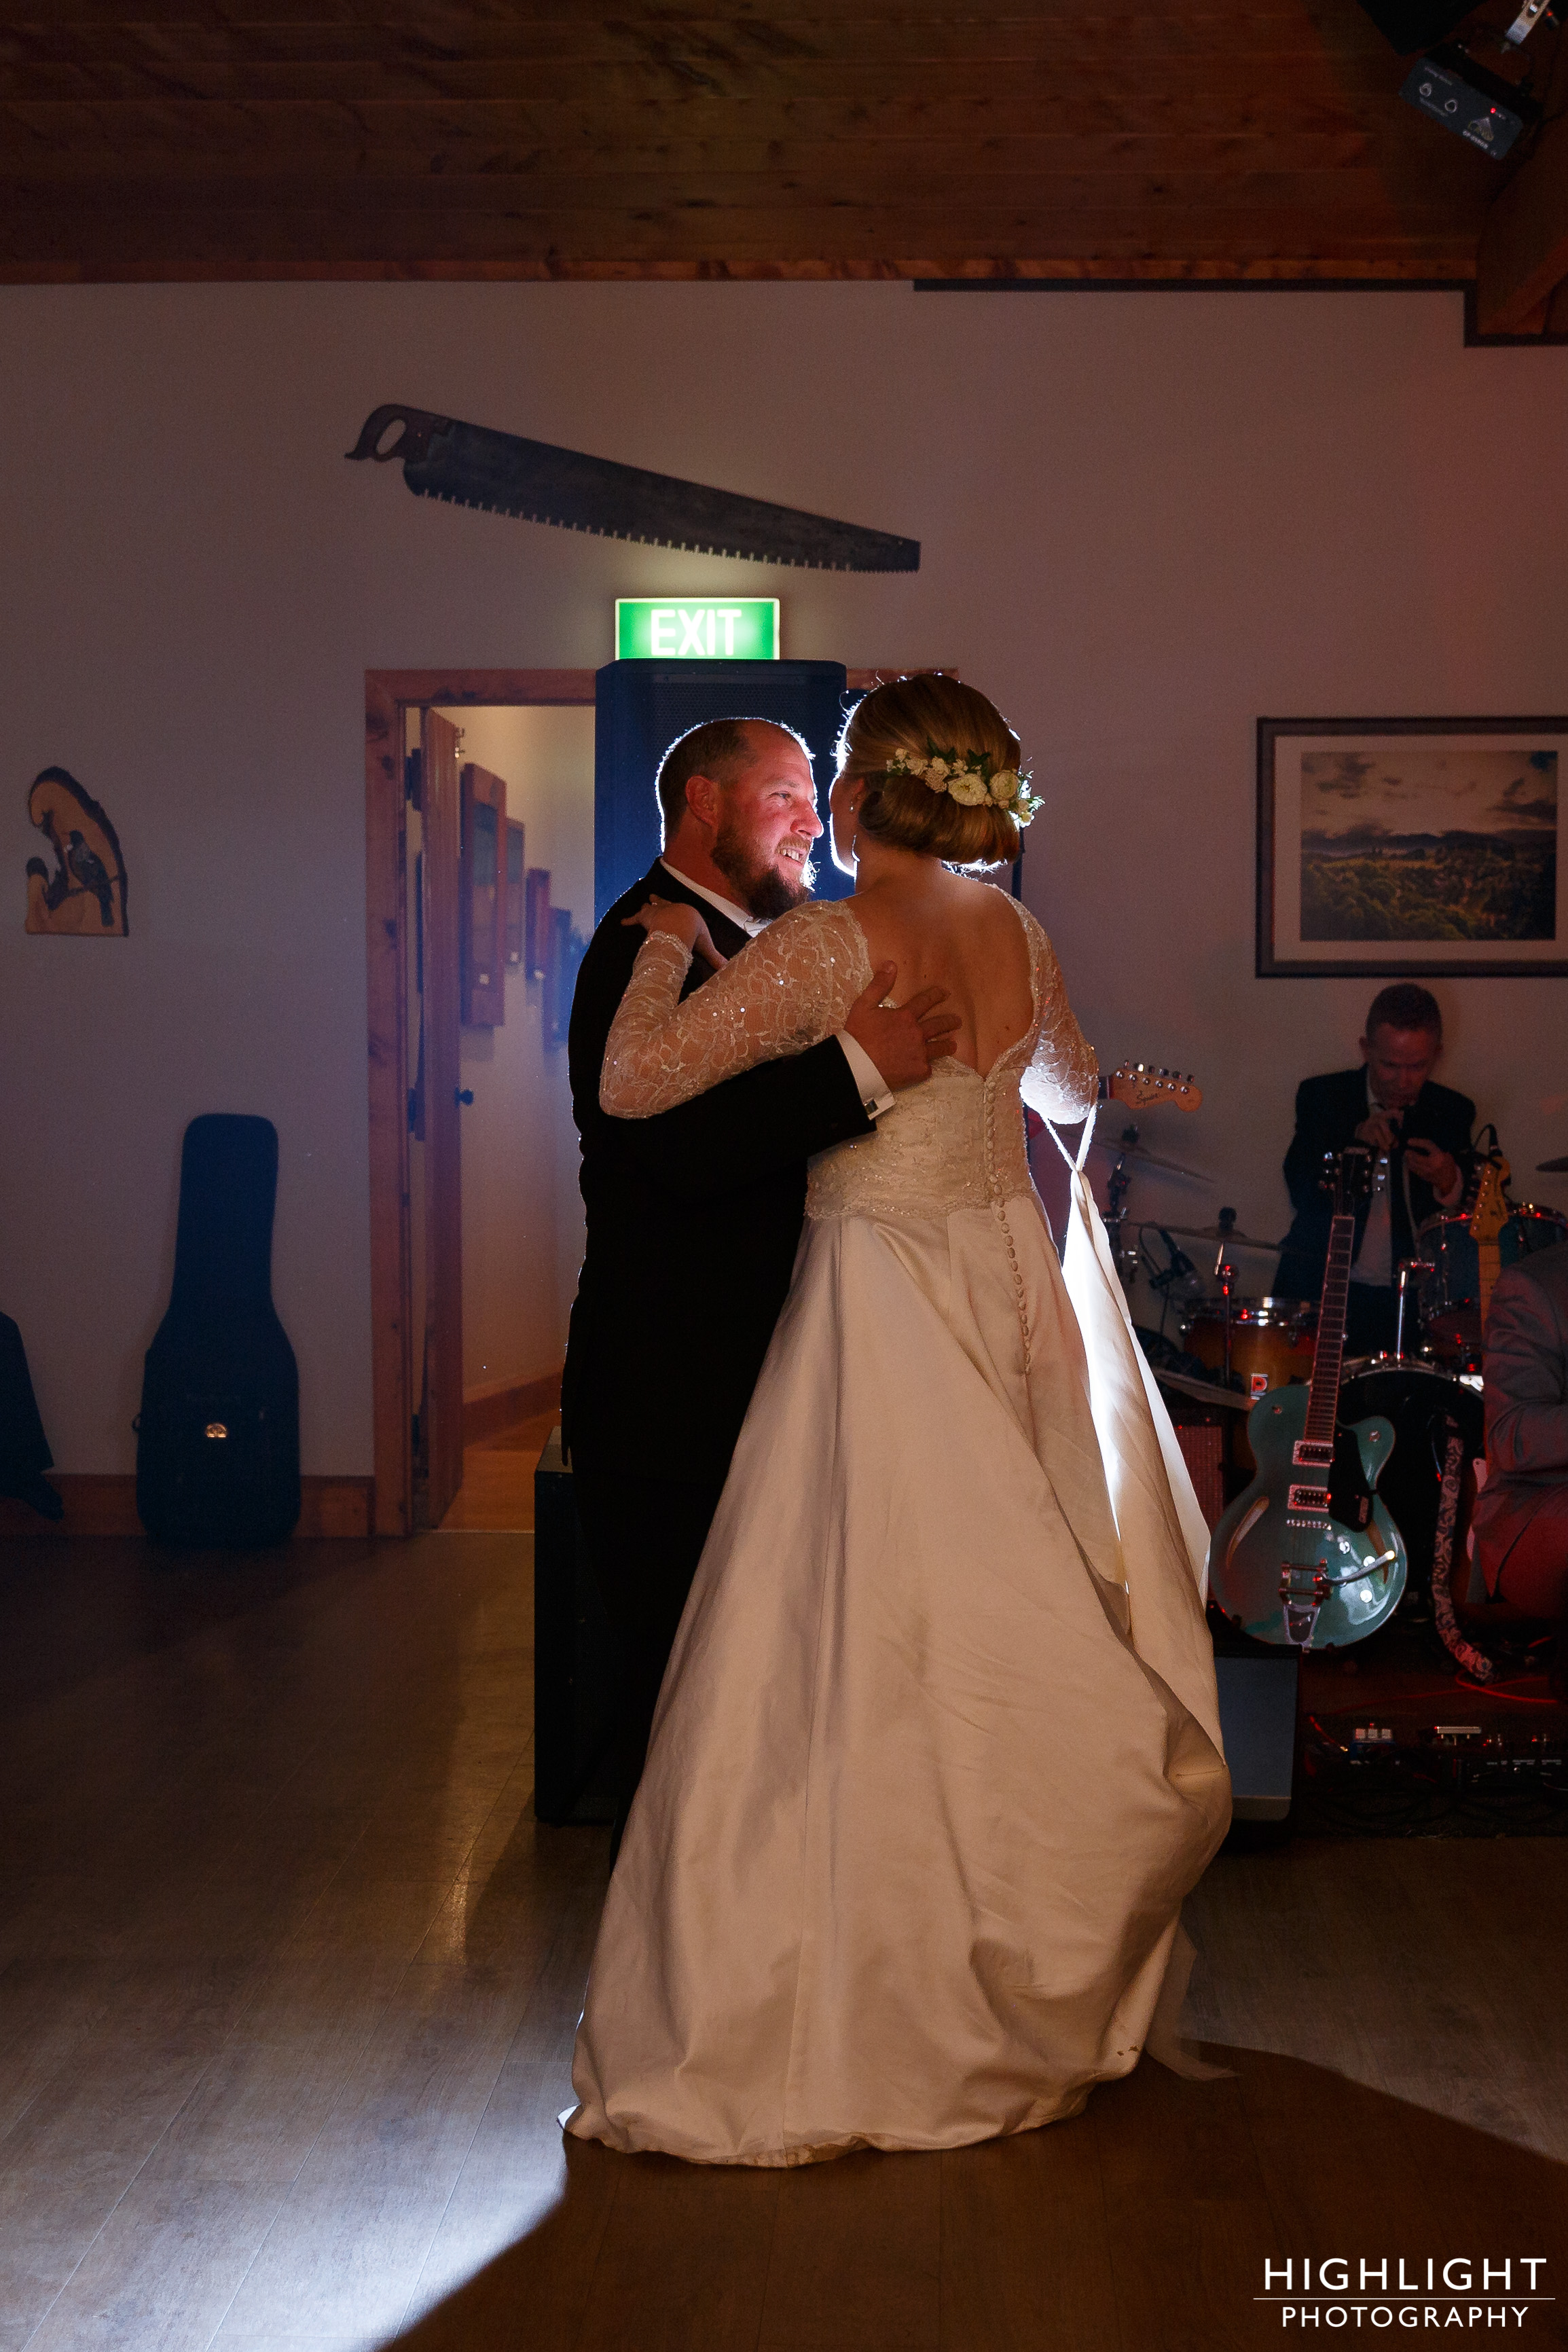 makoura-wedding-photography-highlight-new-zealand-91.jpg